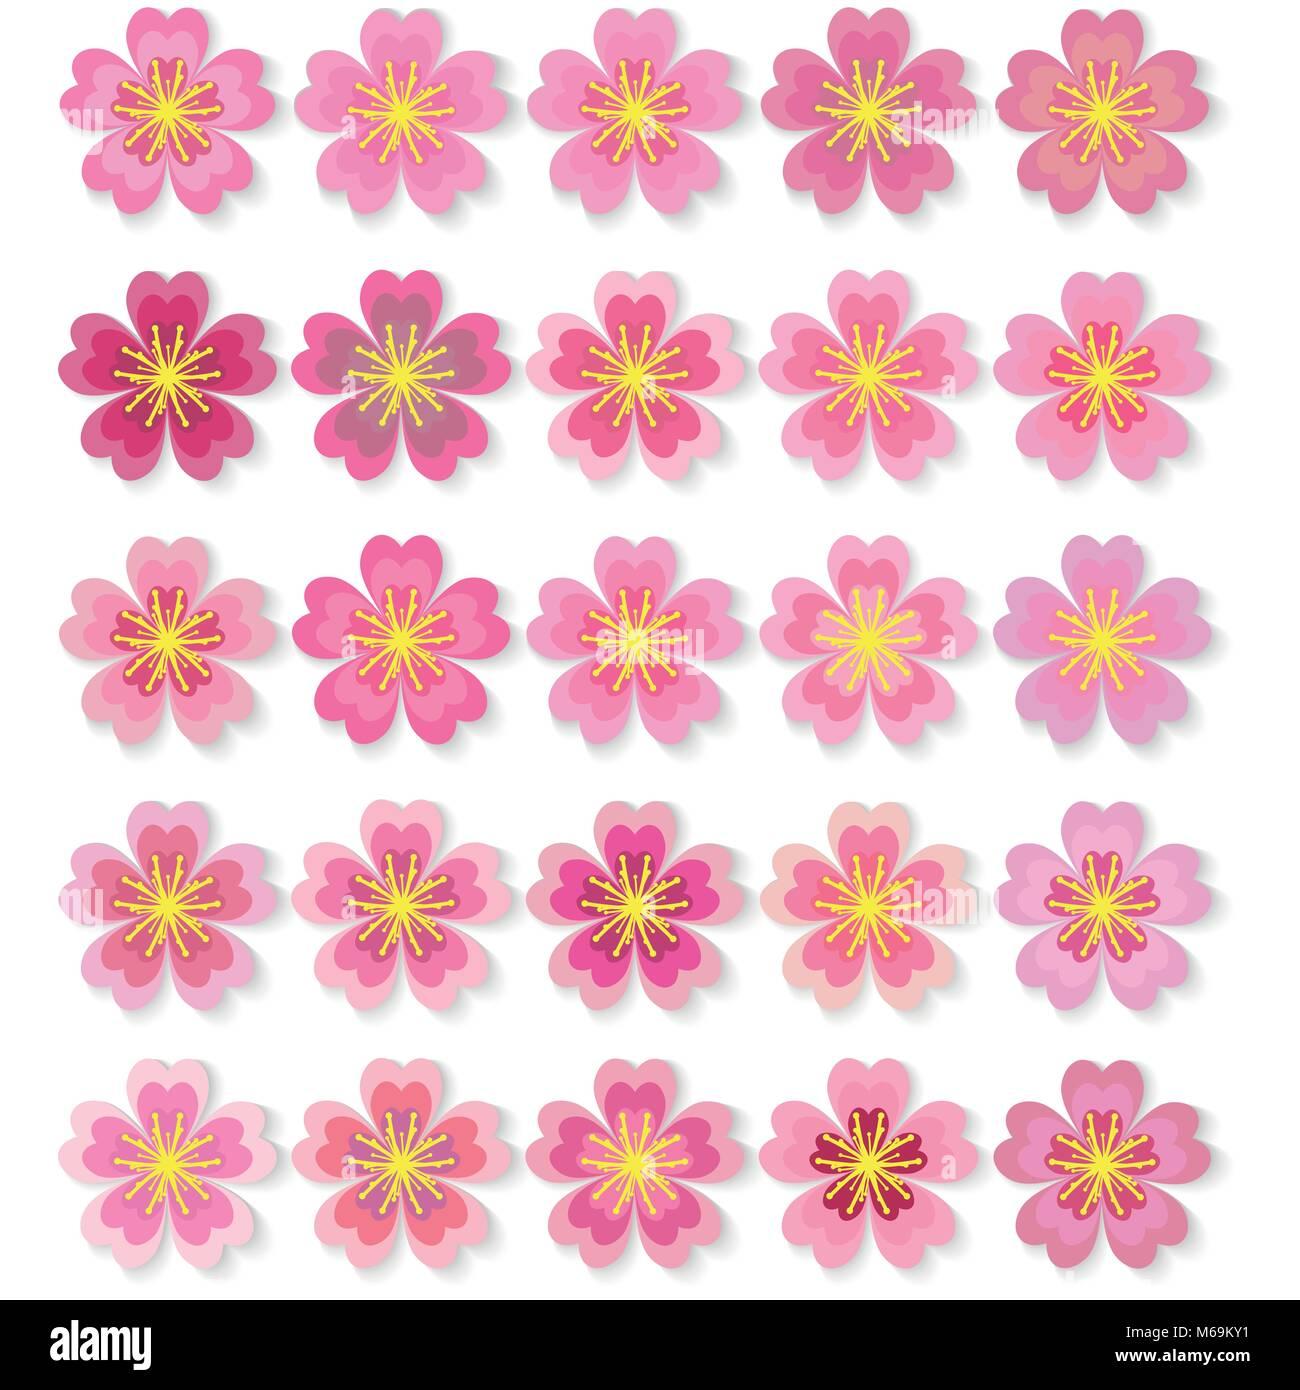 Cherry pink flower spring sakura blossom vector icon set stock cherry pink flower spring sakura blossom vector icon set mightylinksfo Choice Image